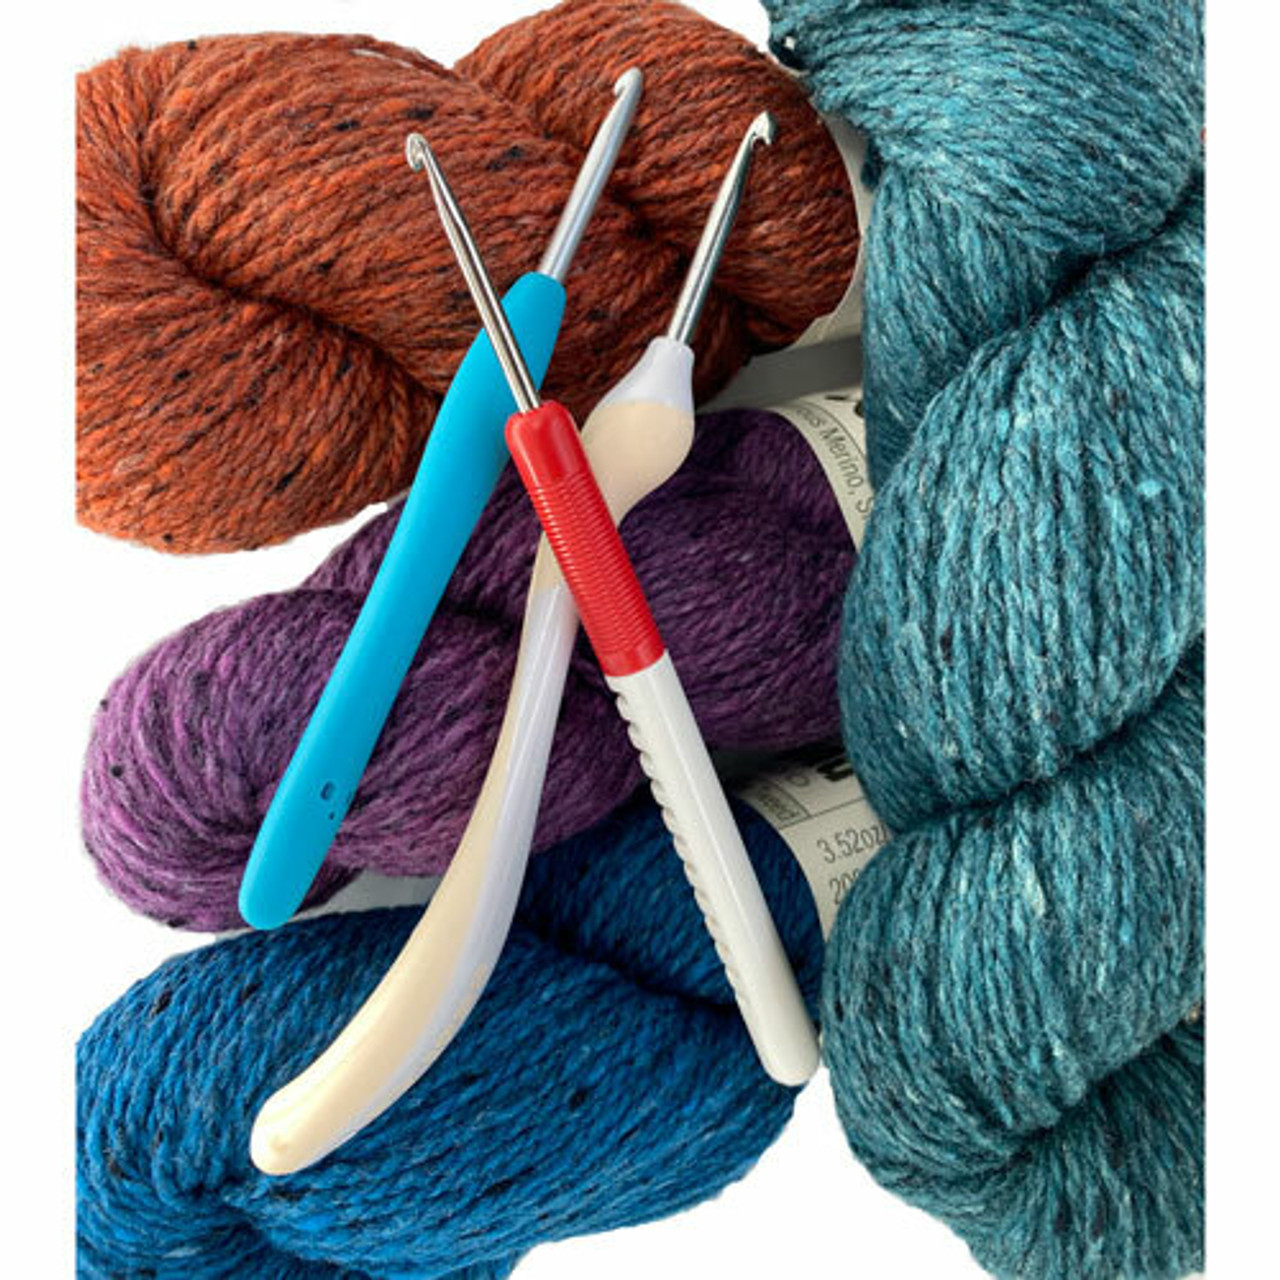 Needles, Hooks and Tools - Crochet - Hooks - Angelika's Yarn Store